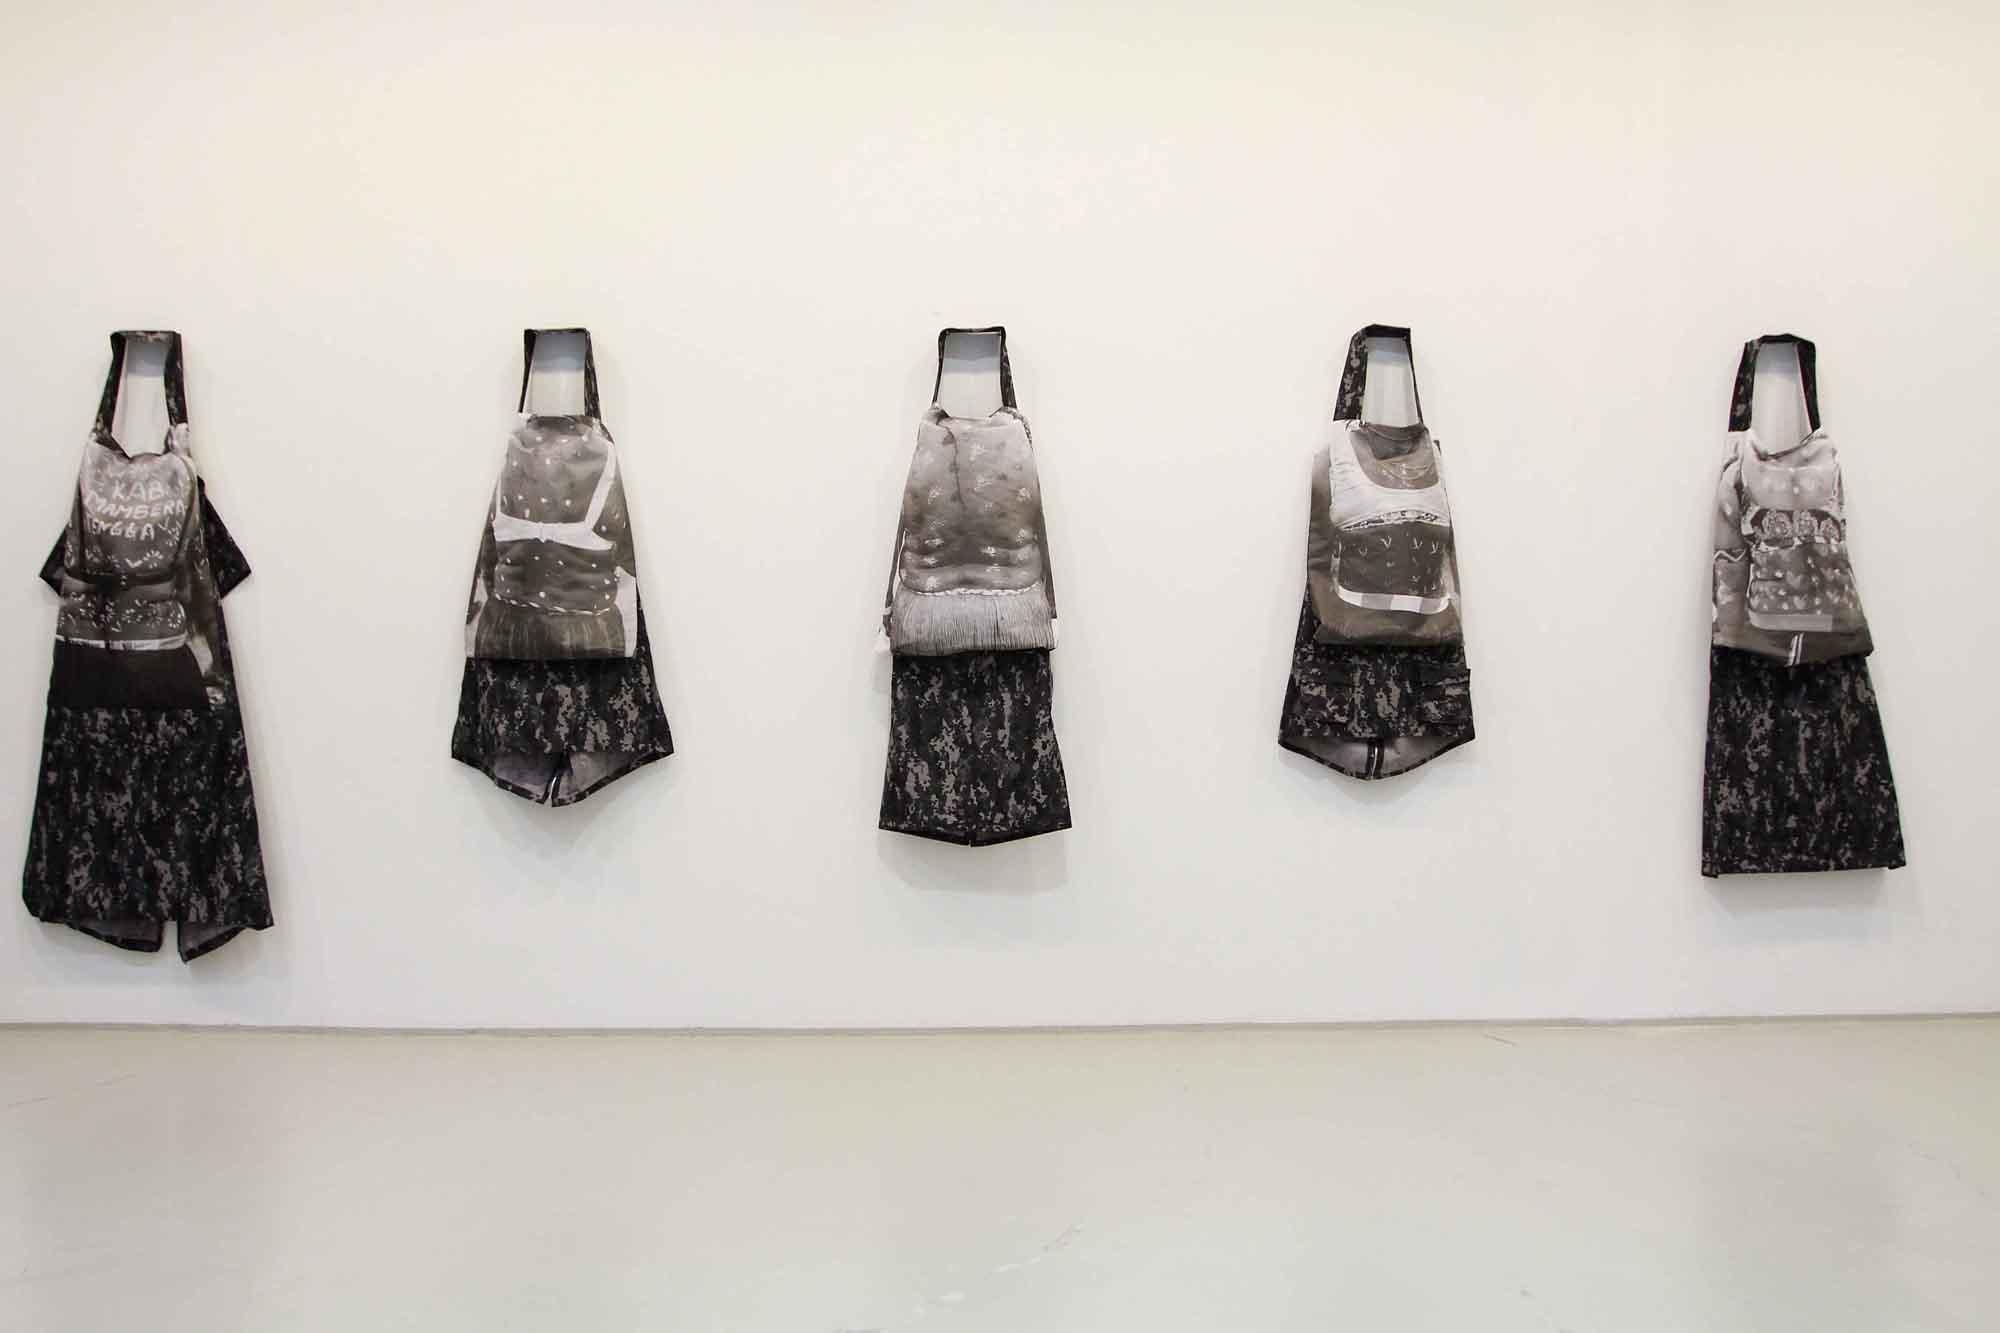 This Shirt Fits Us All (7 costumes), Mella Jarsma, media Digital print on textile, 2009